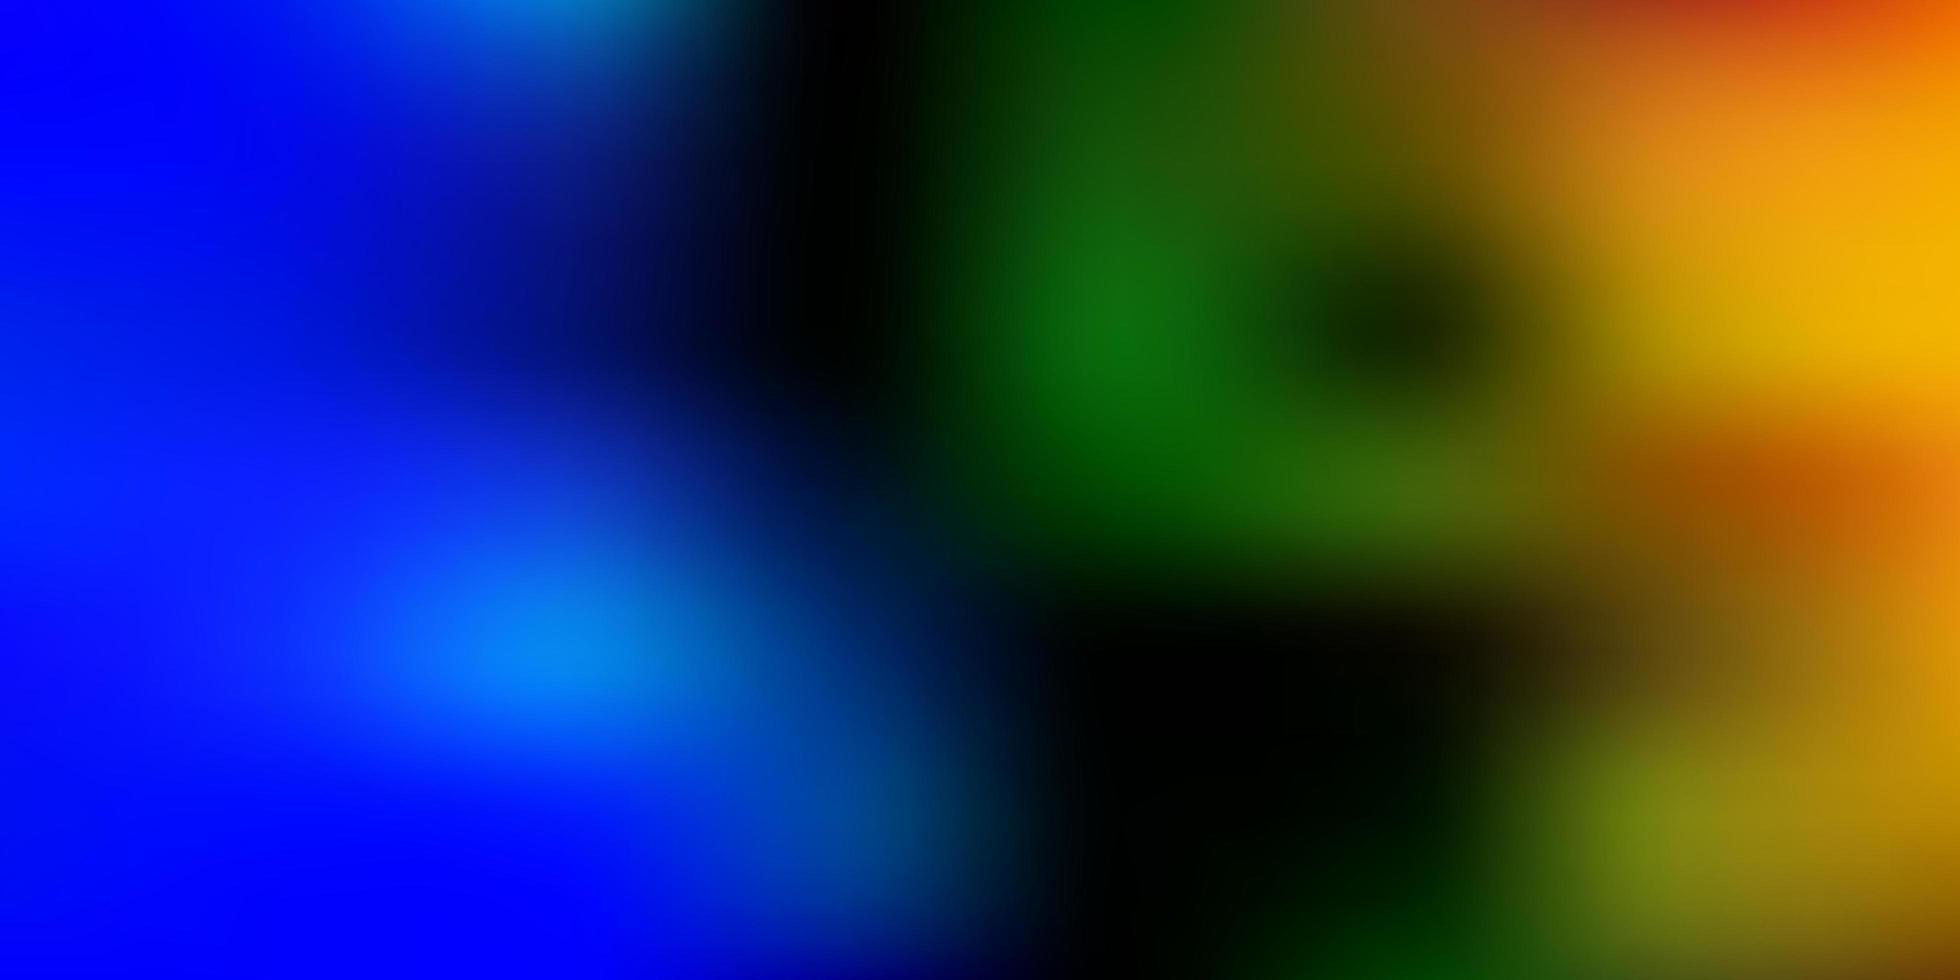 hellblaues, grünes Vektorverlaufsunschärfe-Layout. vektor